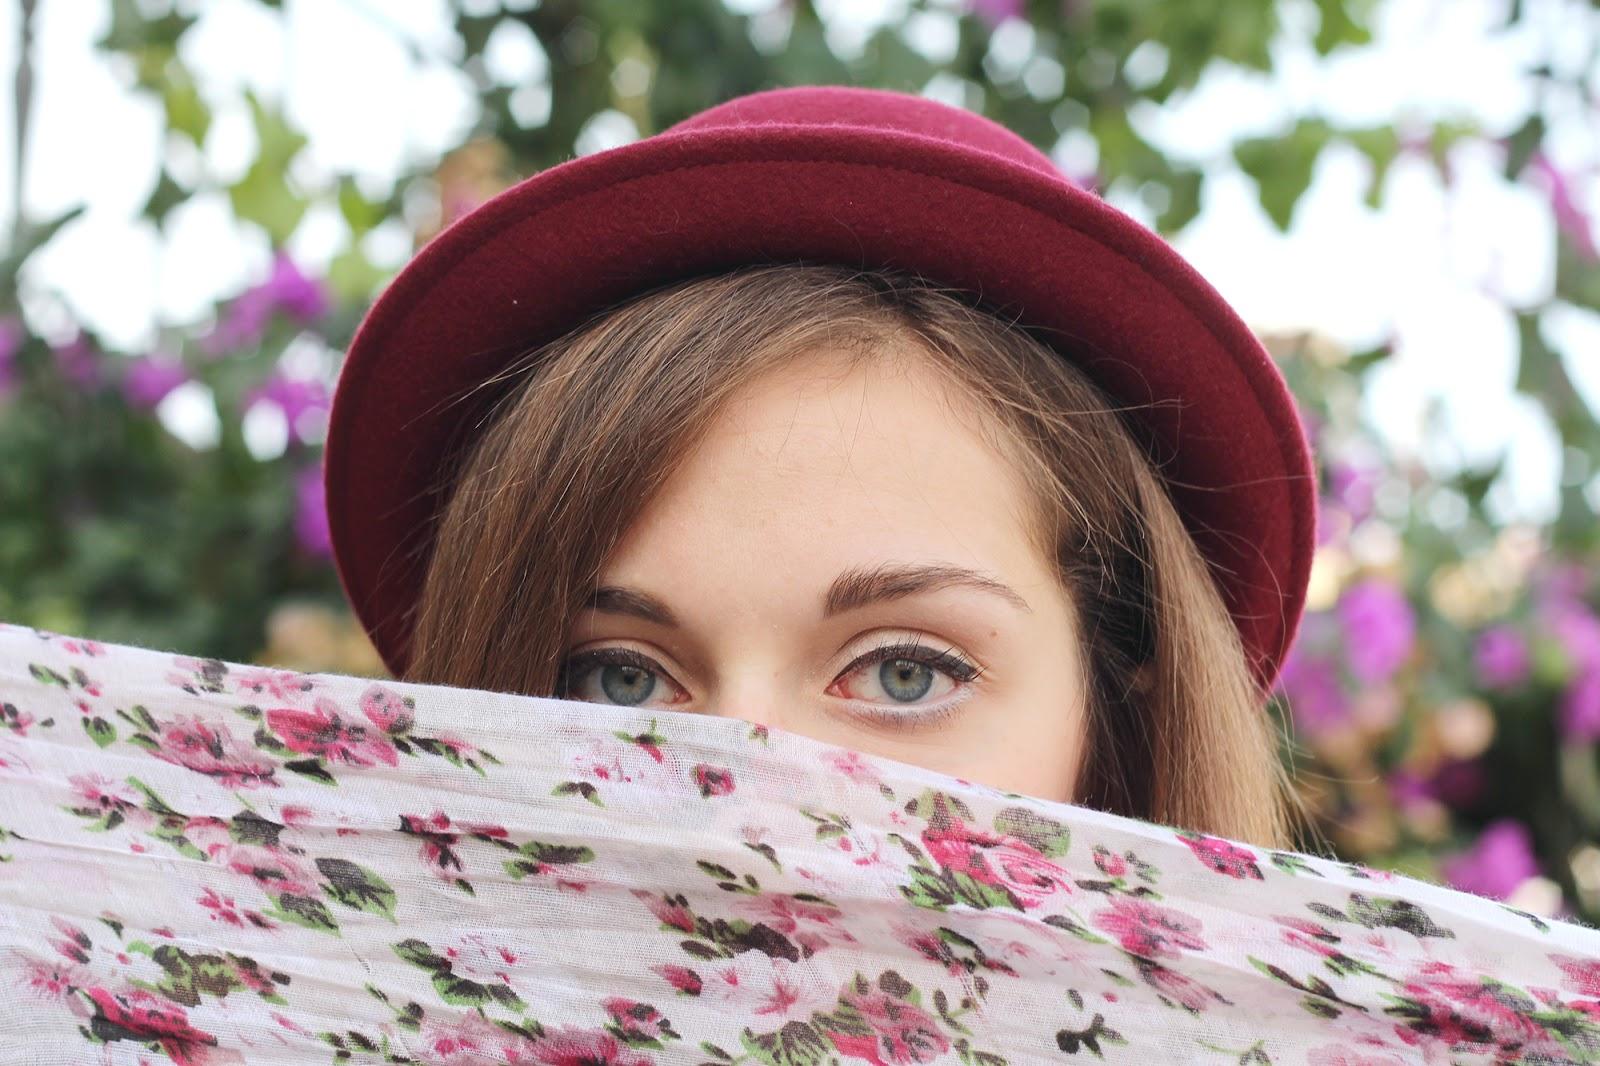 italian girl fashion blogger hat cappello occhi eyes light flowers fashion